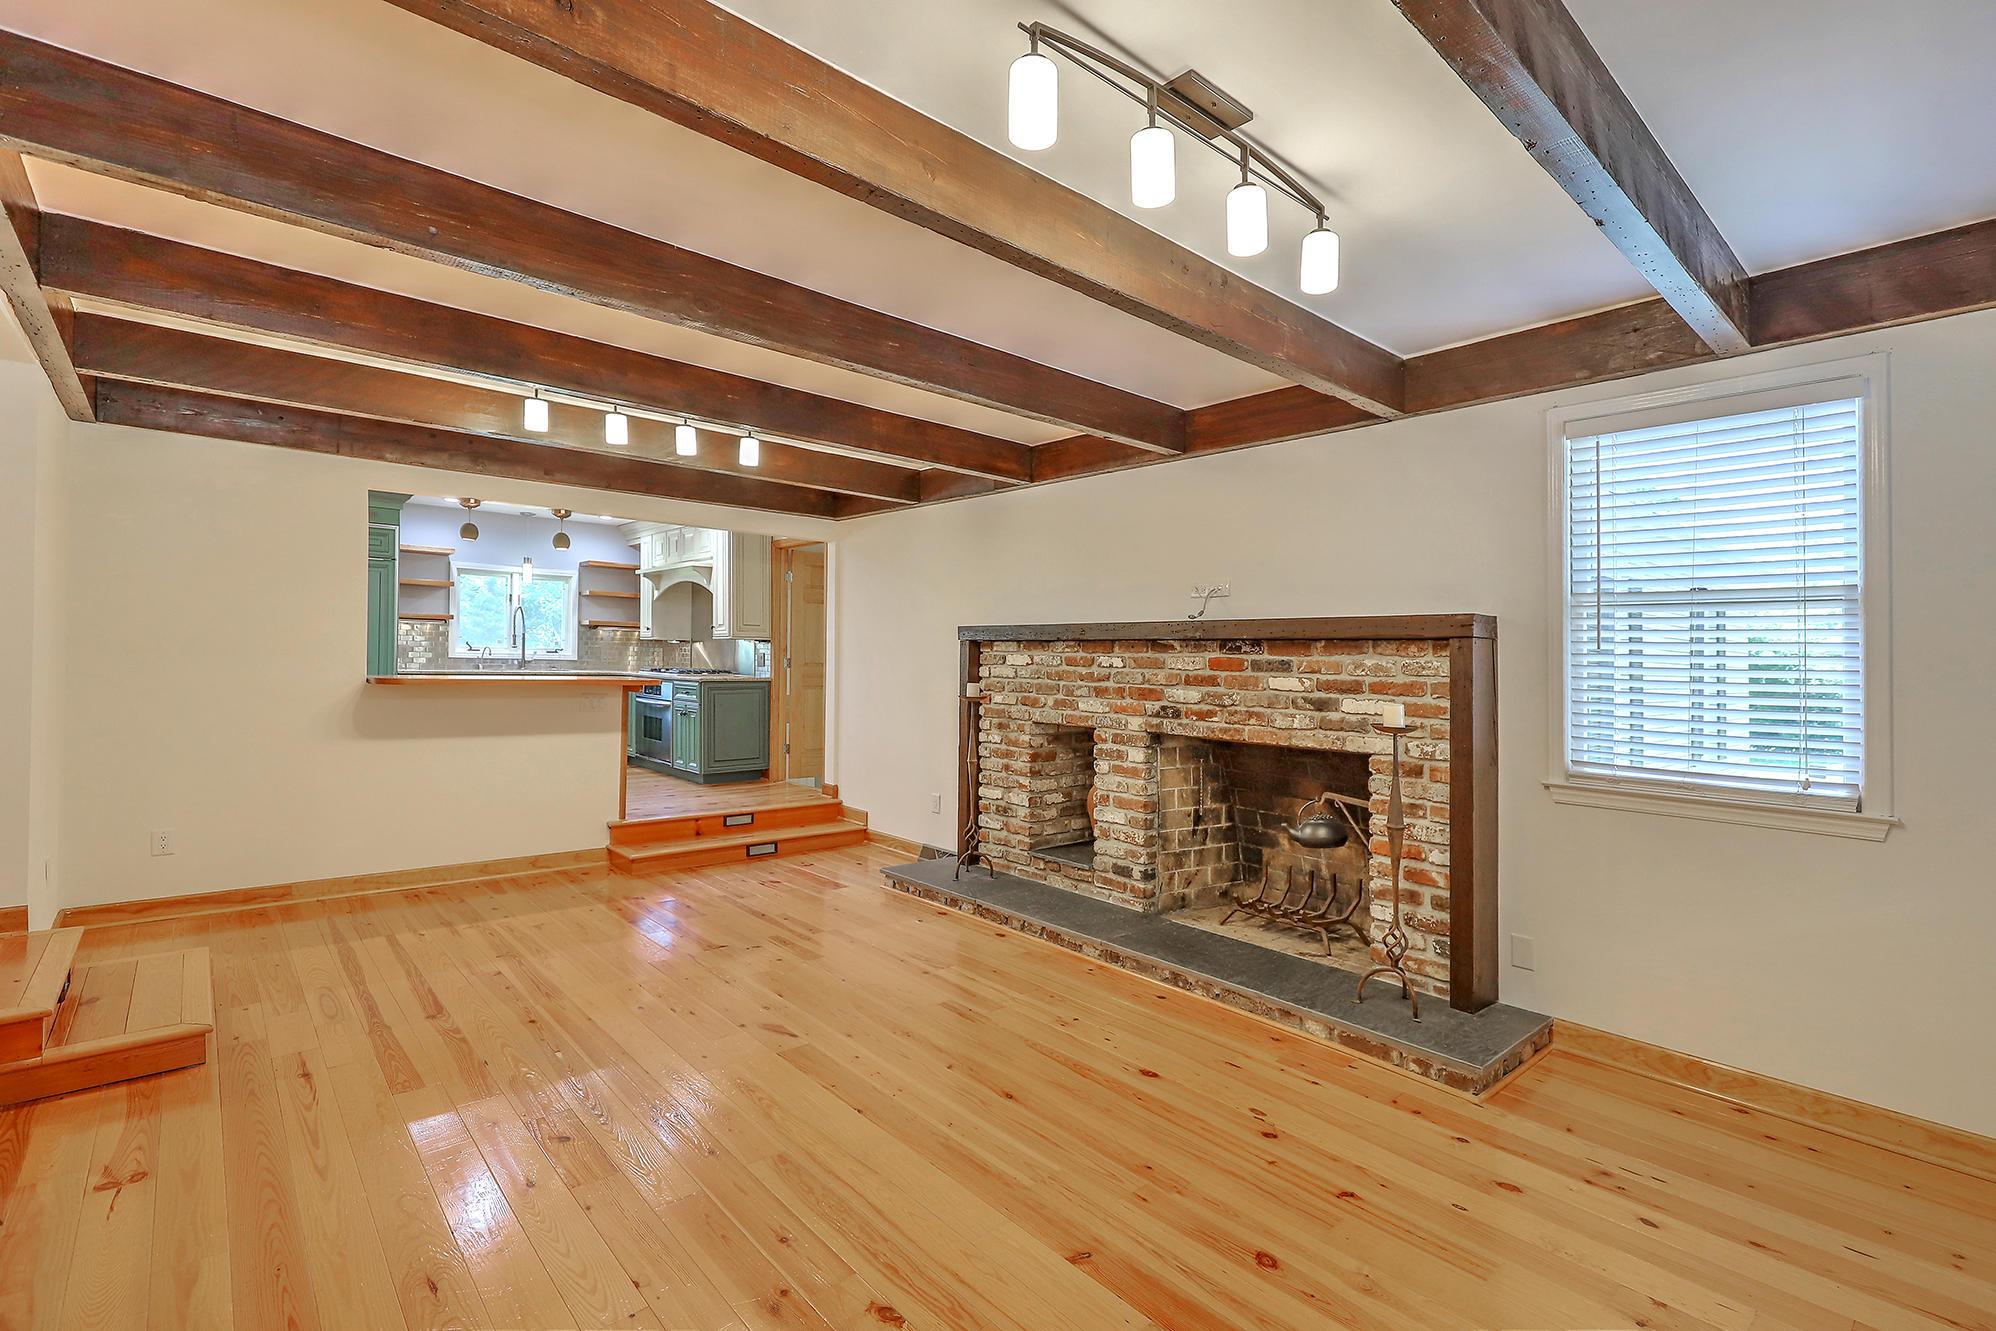 Edgewater Park Homes For Sale - 1413 Edsent, Charleston, SC - 10